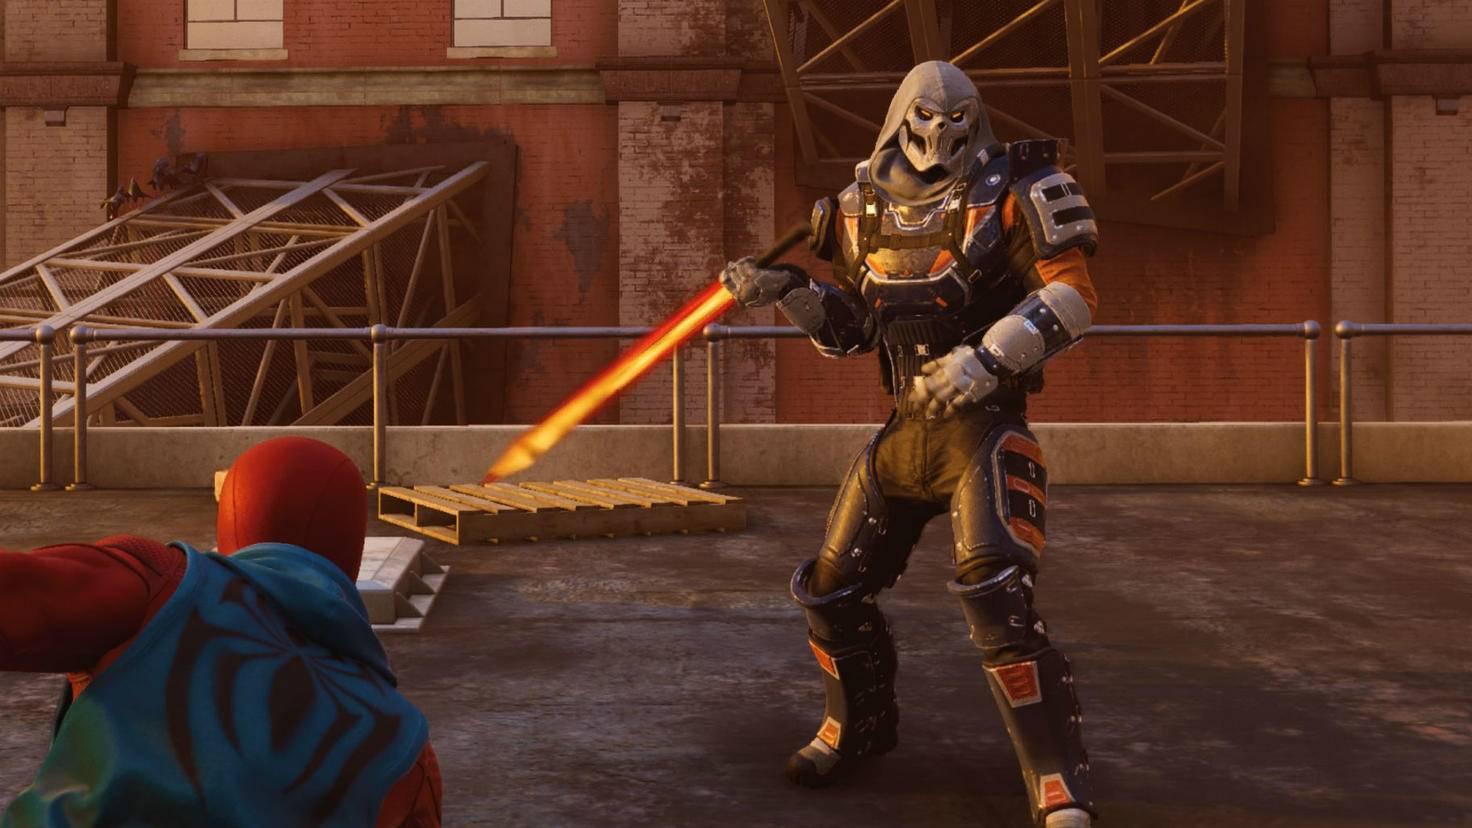 spider-man-ps4-taskmaster-screenshot